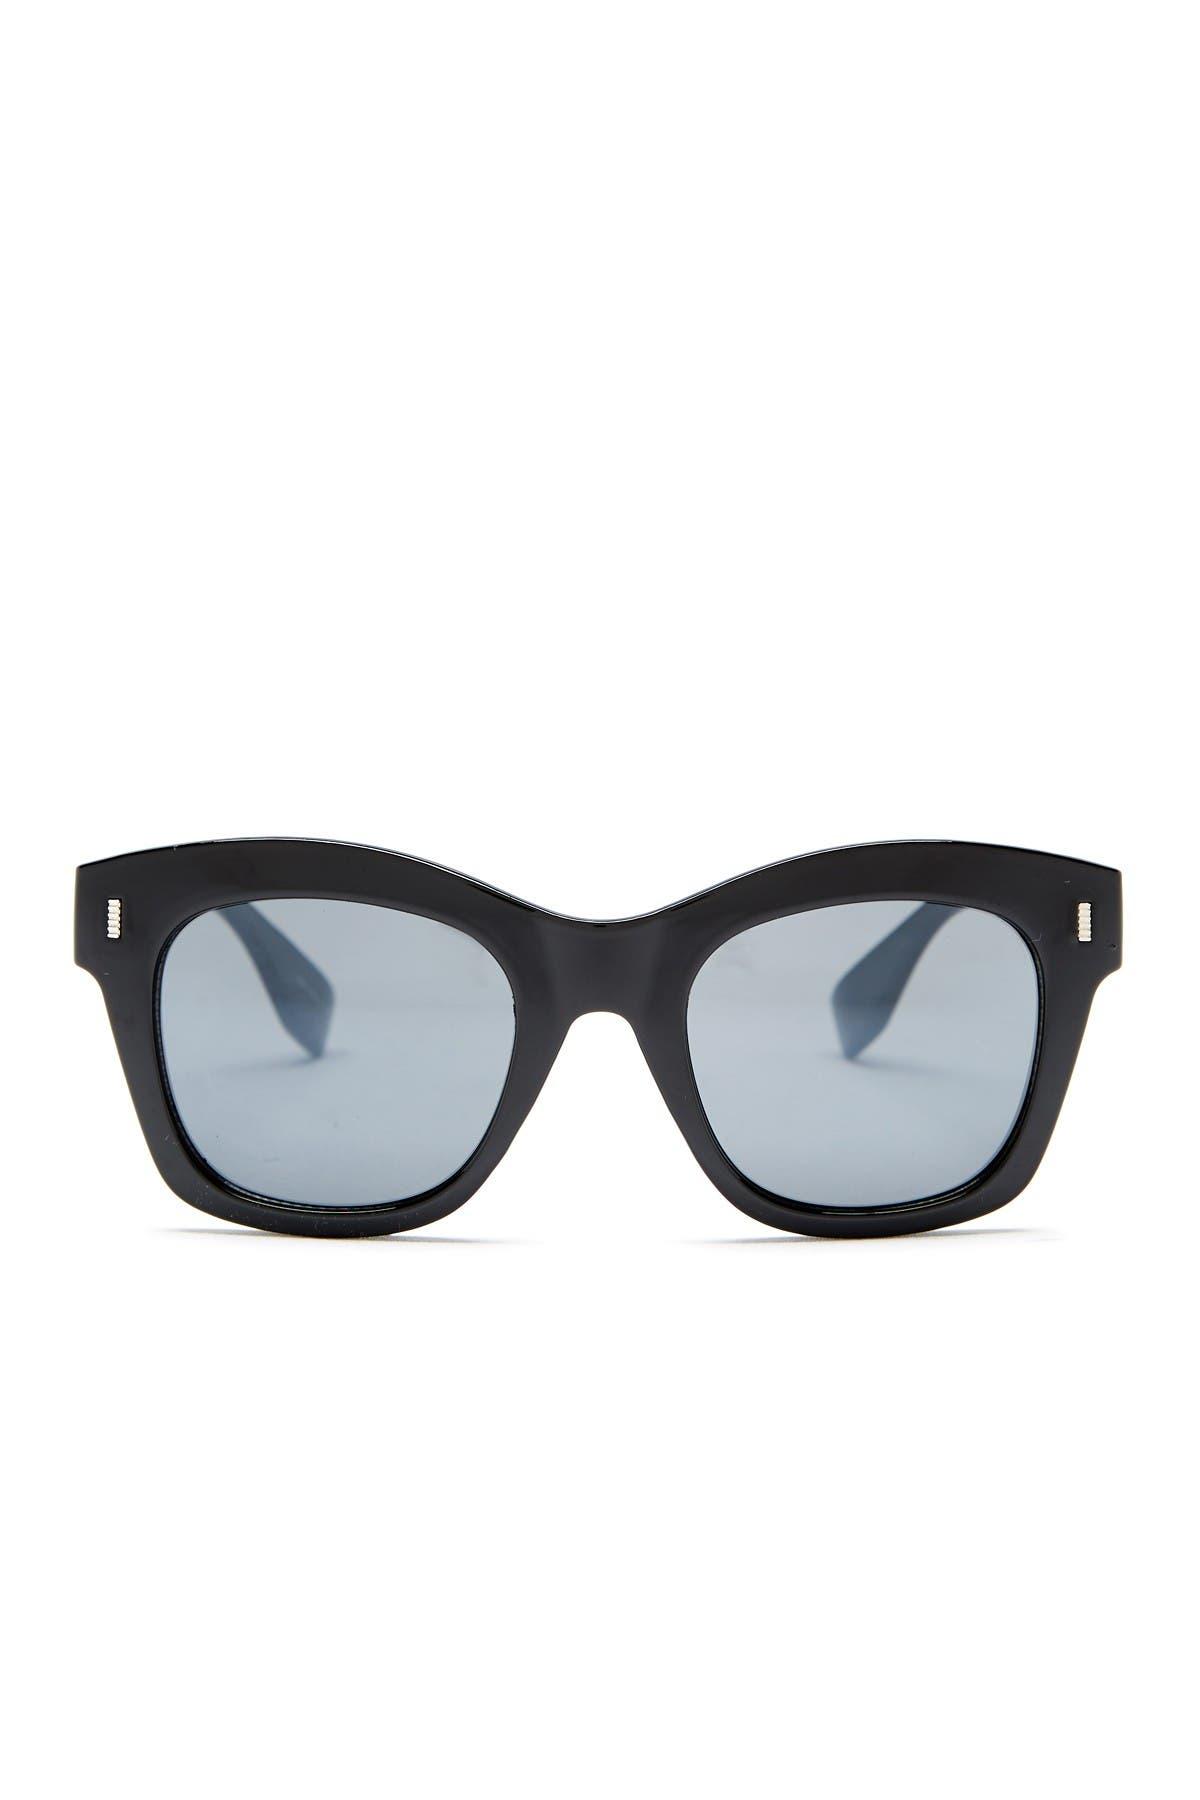 Image of Joe's Jeans 51mm Retro Sunglasses